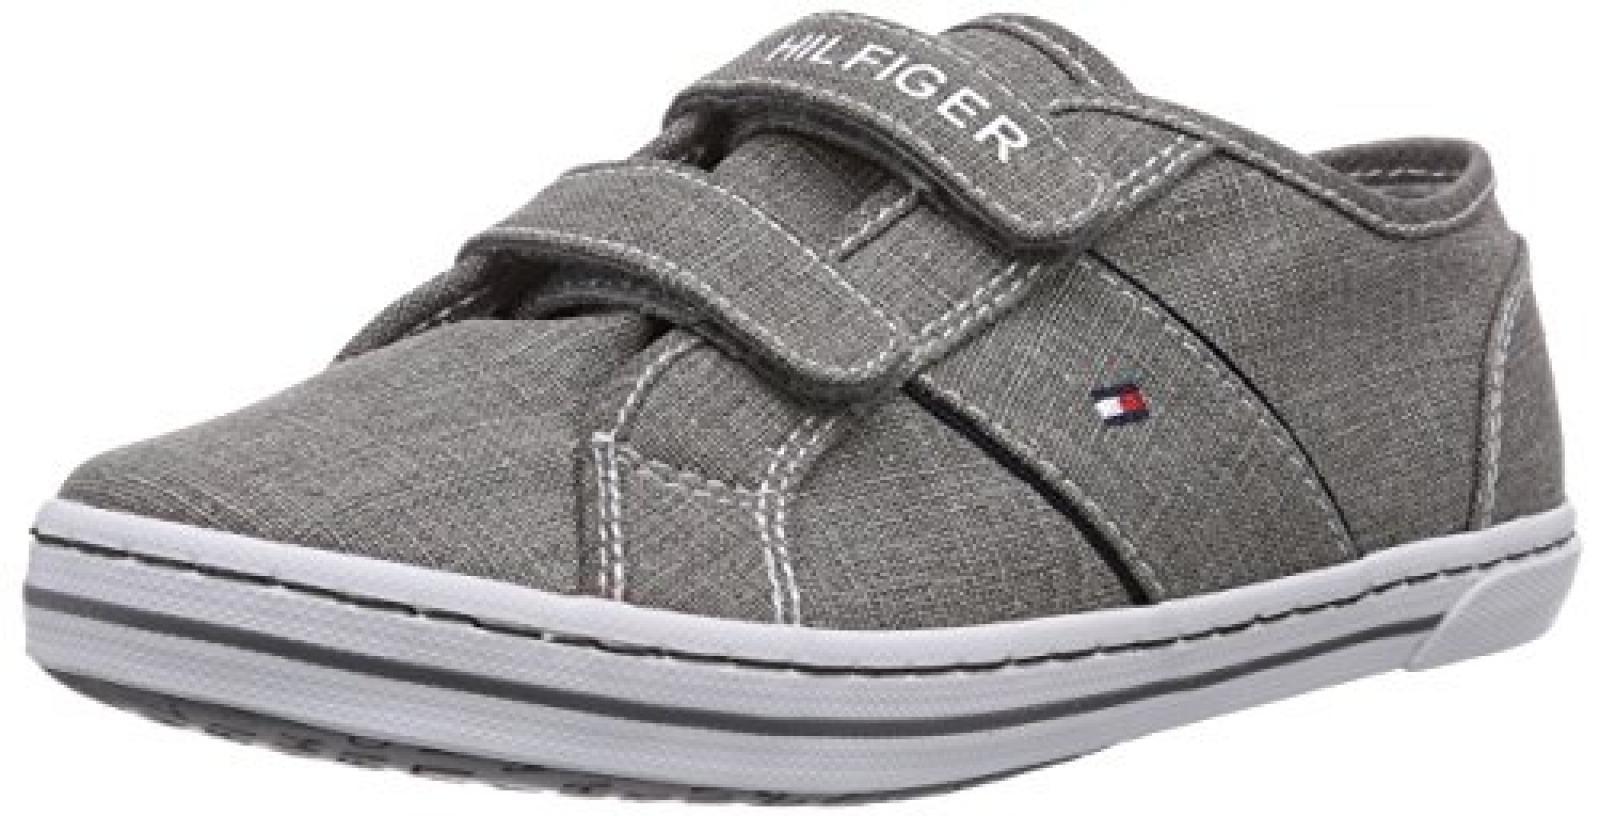 Tommy Hilfiger SLATER 3E Jungen Sneakers